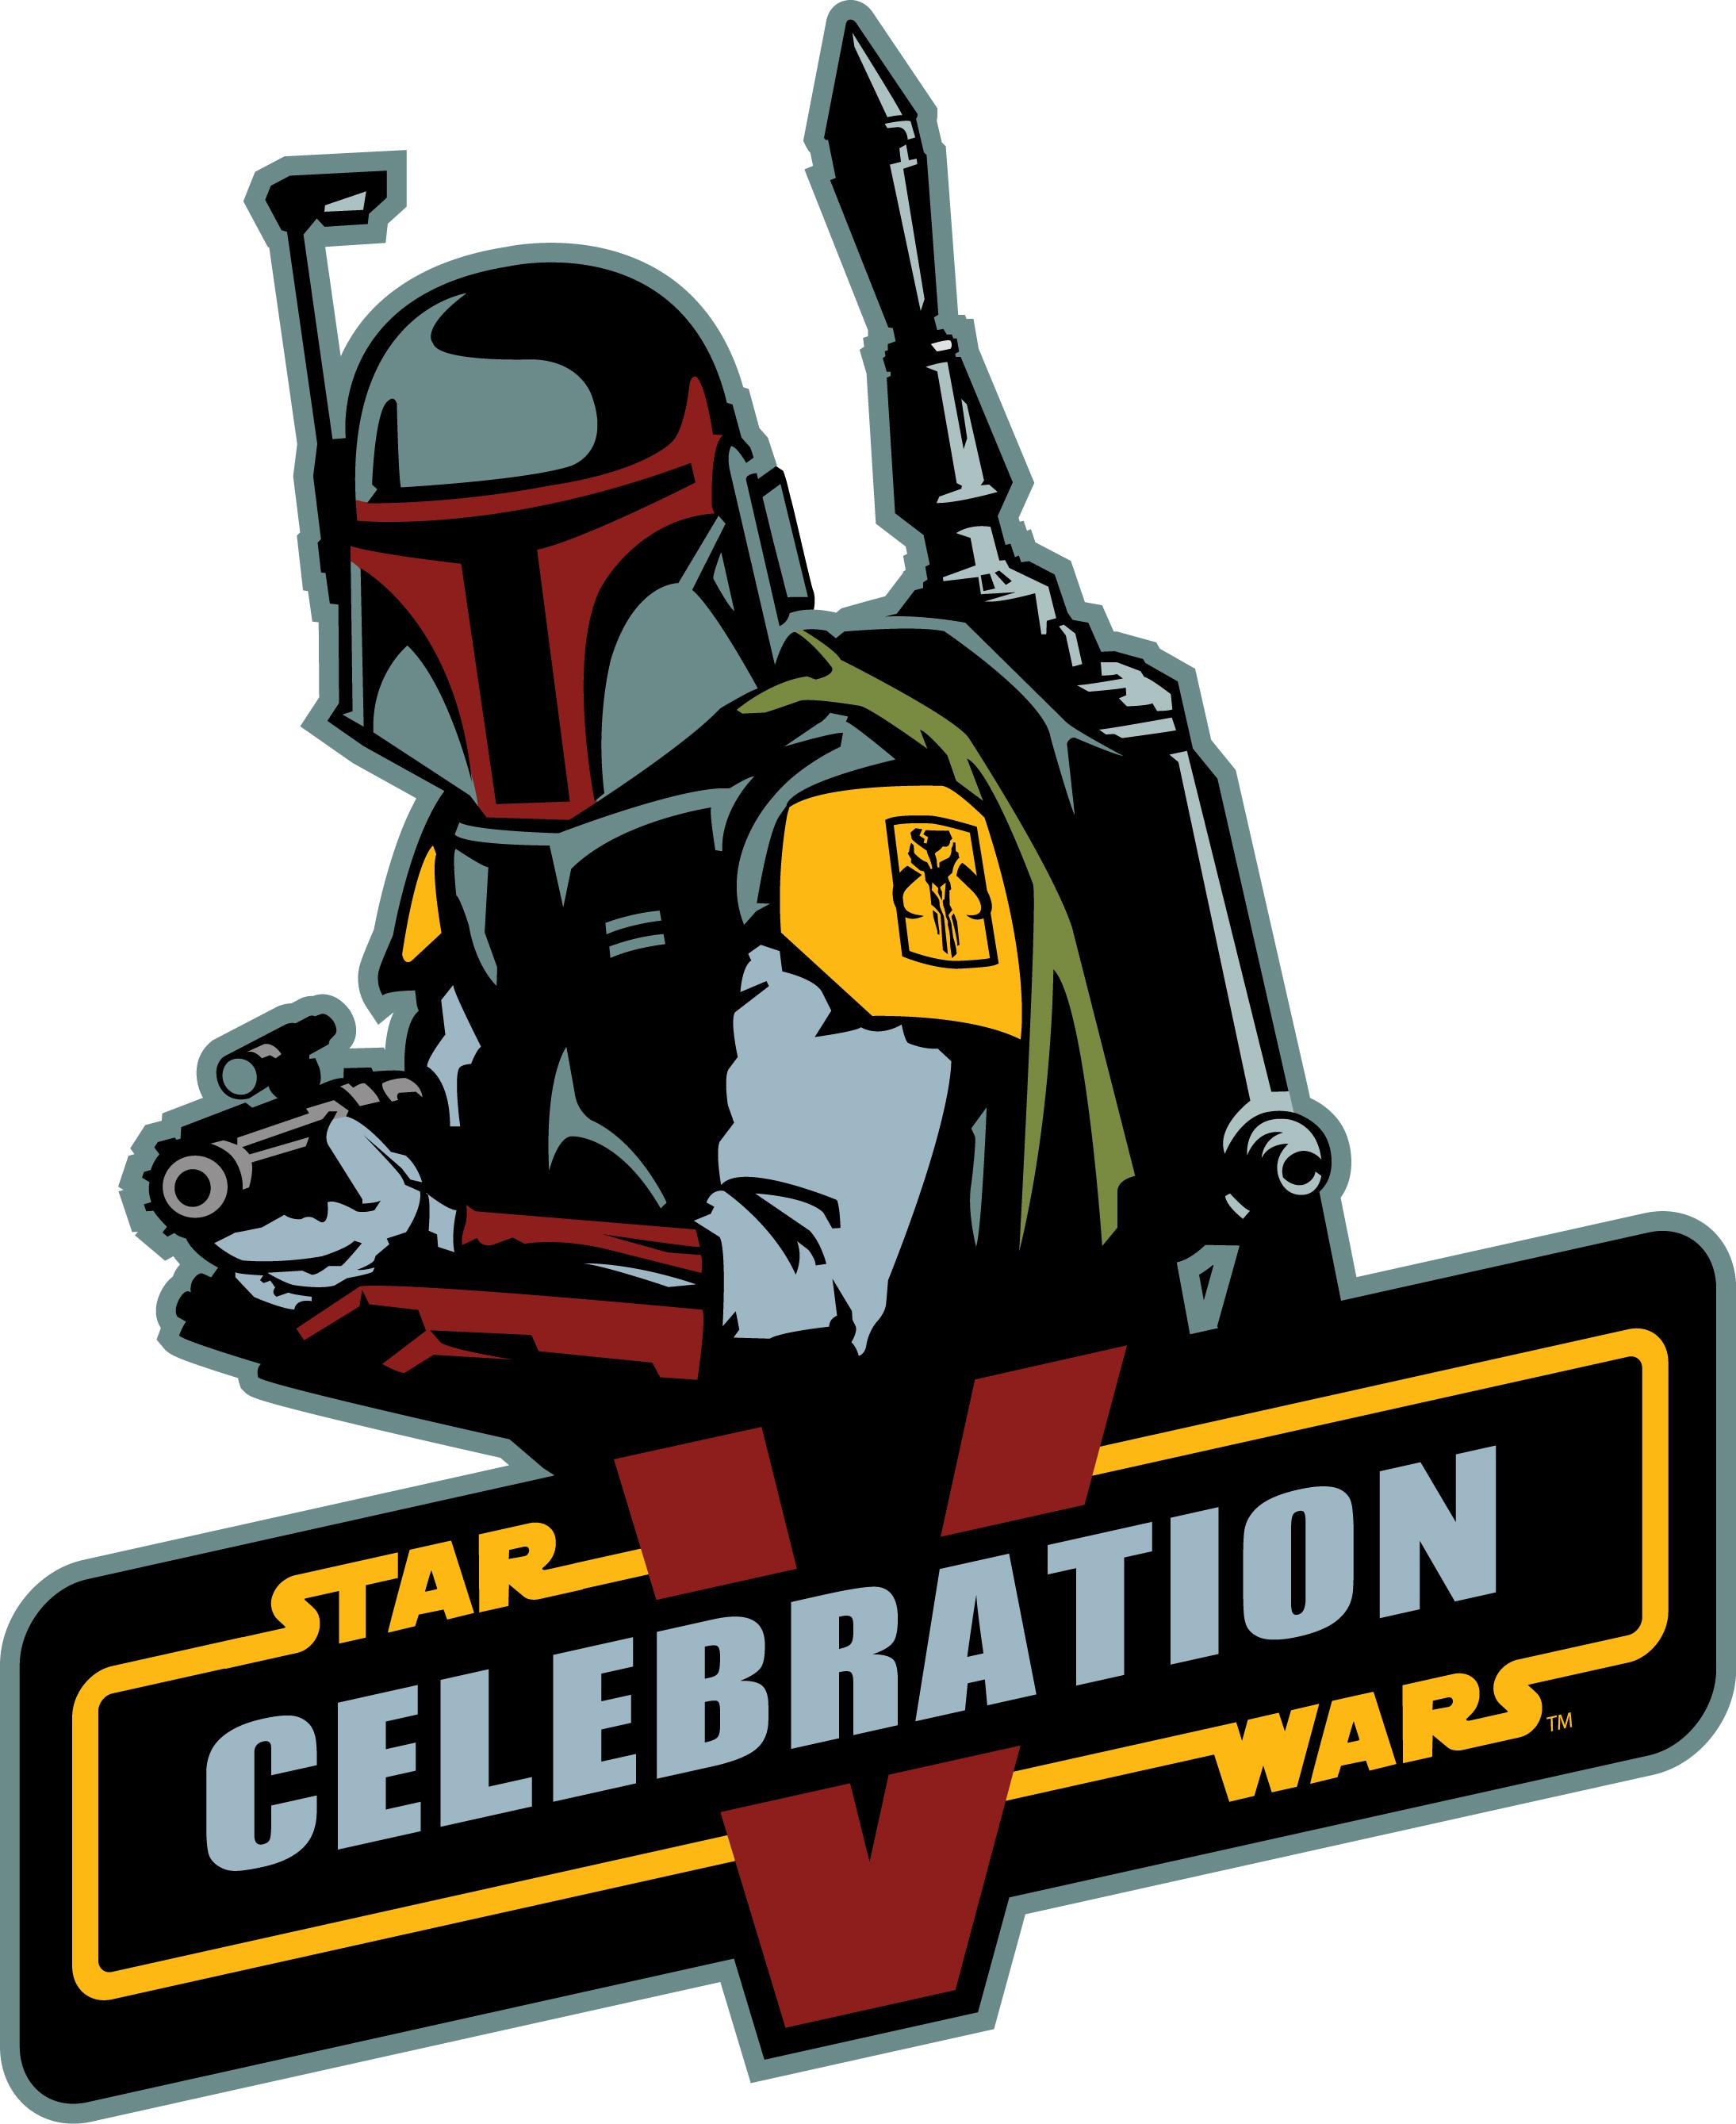 Need More Star Wars? Celebration V Orlando August 12-15